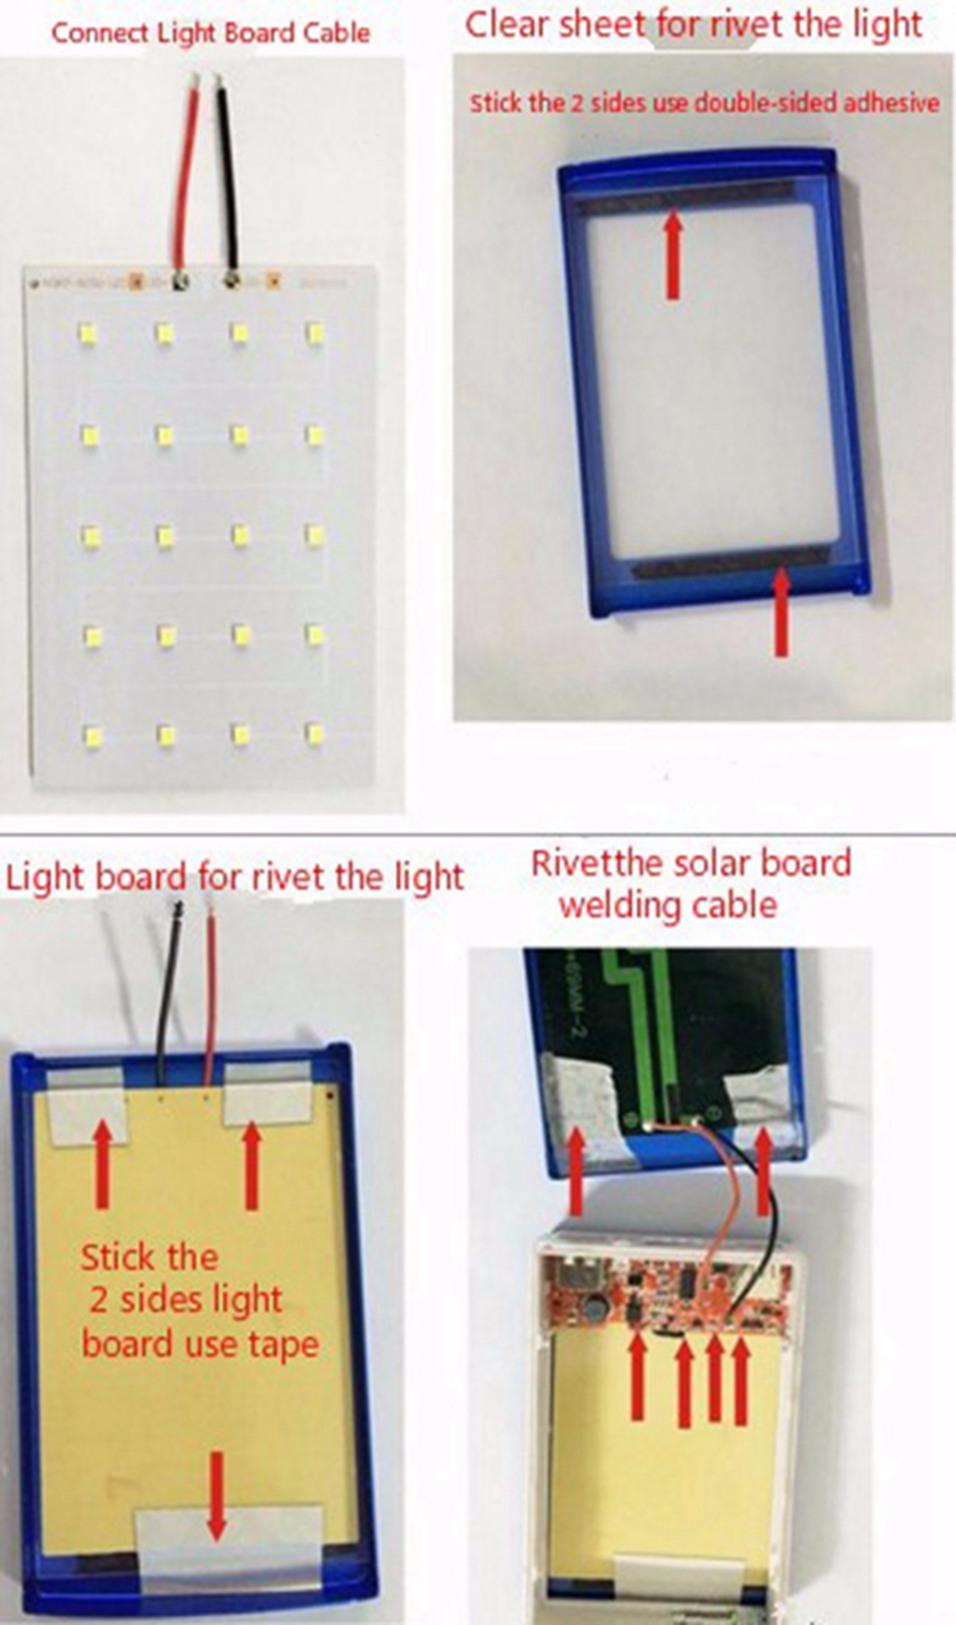 Icoque 18650 Solar Power Bank Case DIY Box Dual USB Kit Phone Charger Flashlight 5x18650 Powerbank Portable Pover Power Bank (16)